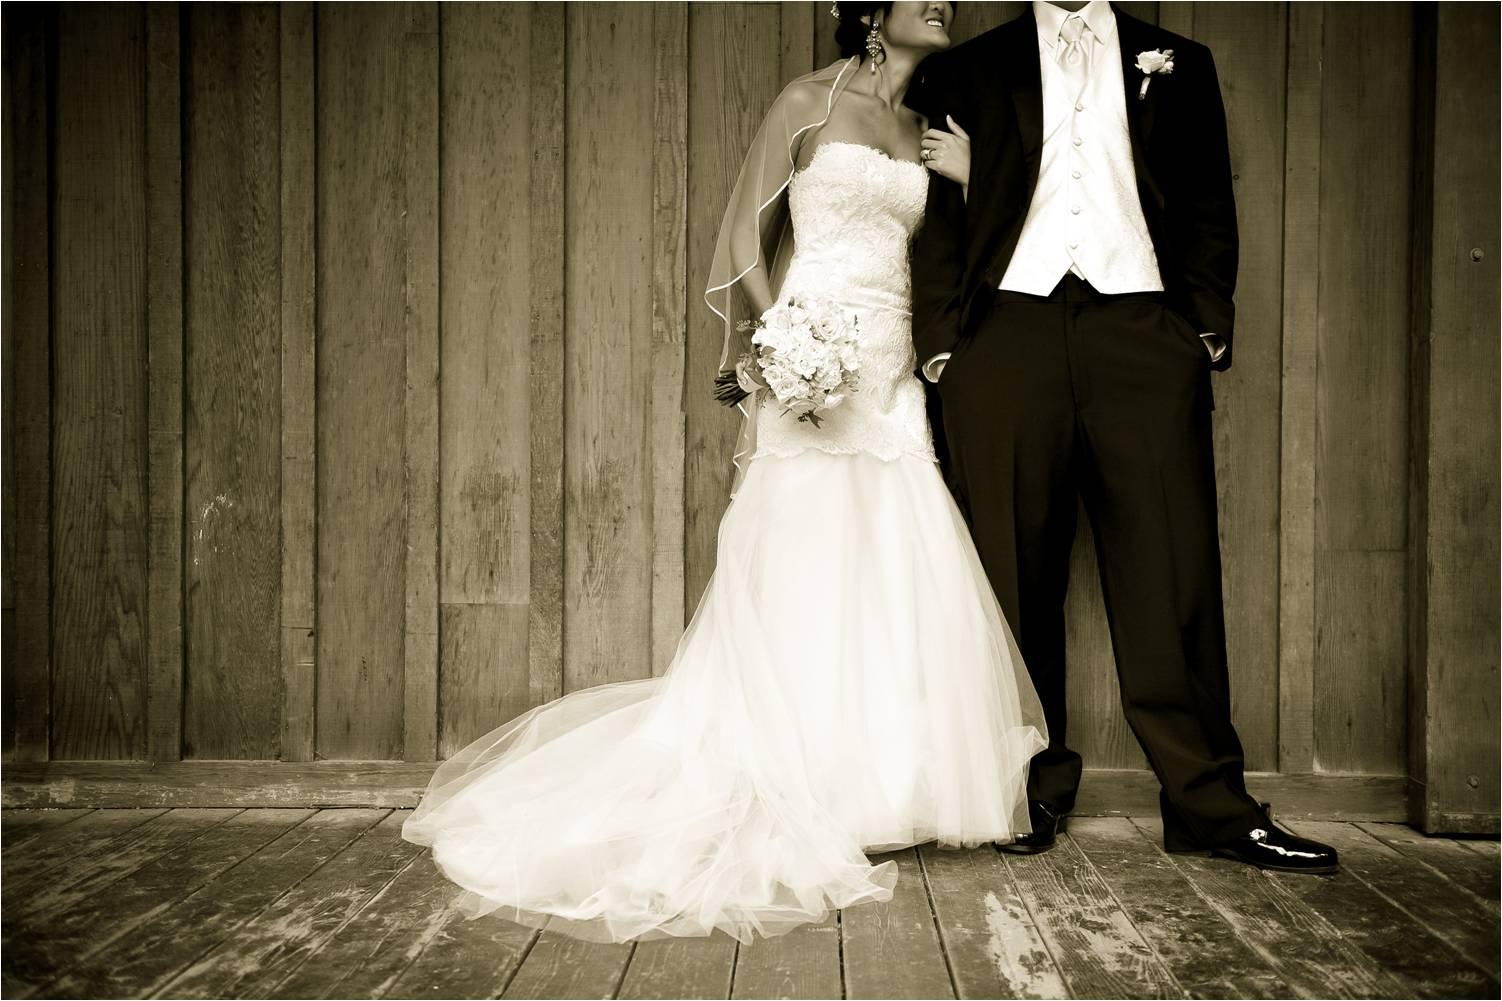 Wedding Decoration Wedding Dresses For Rustic Outdoor Wedding